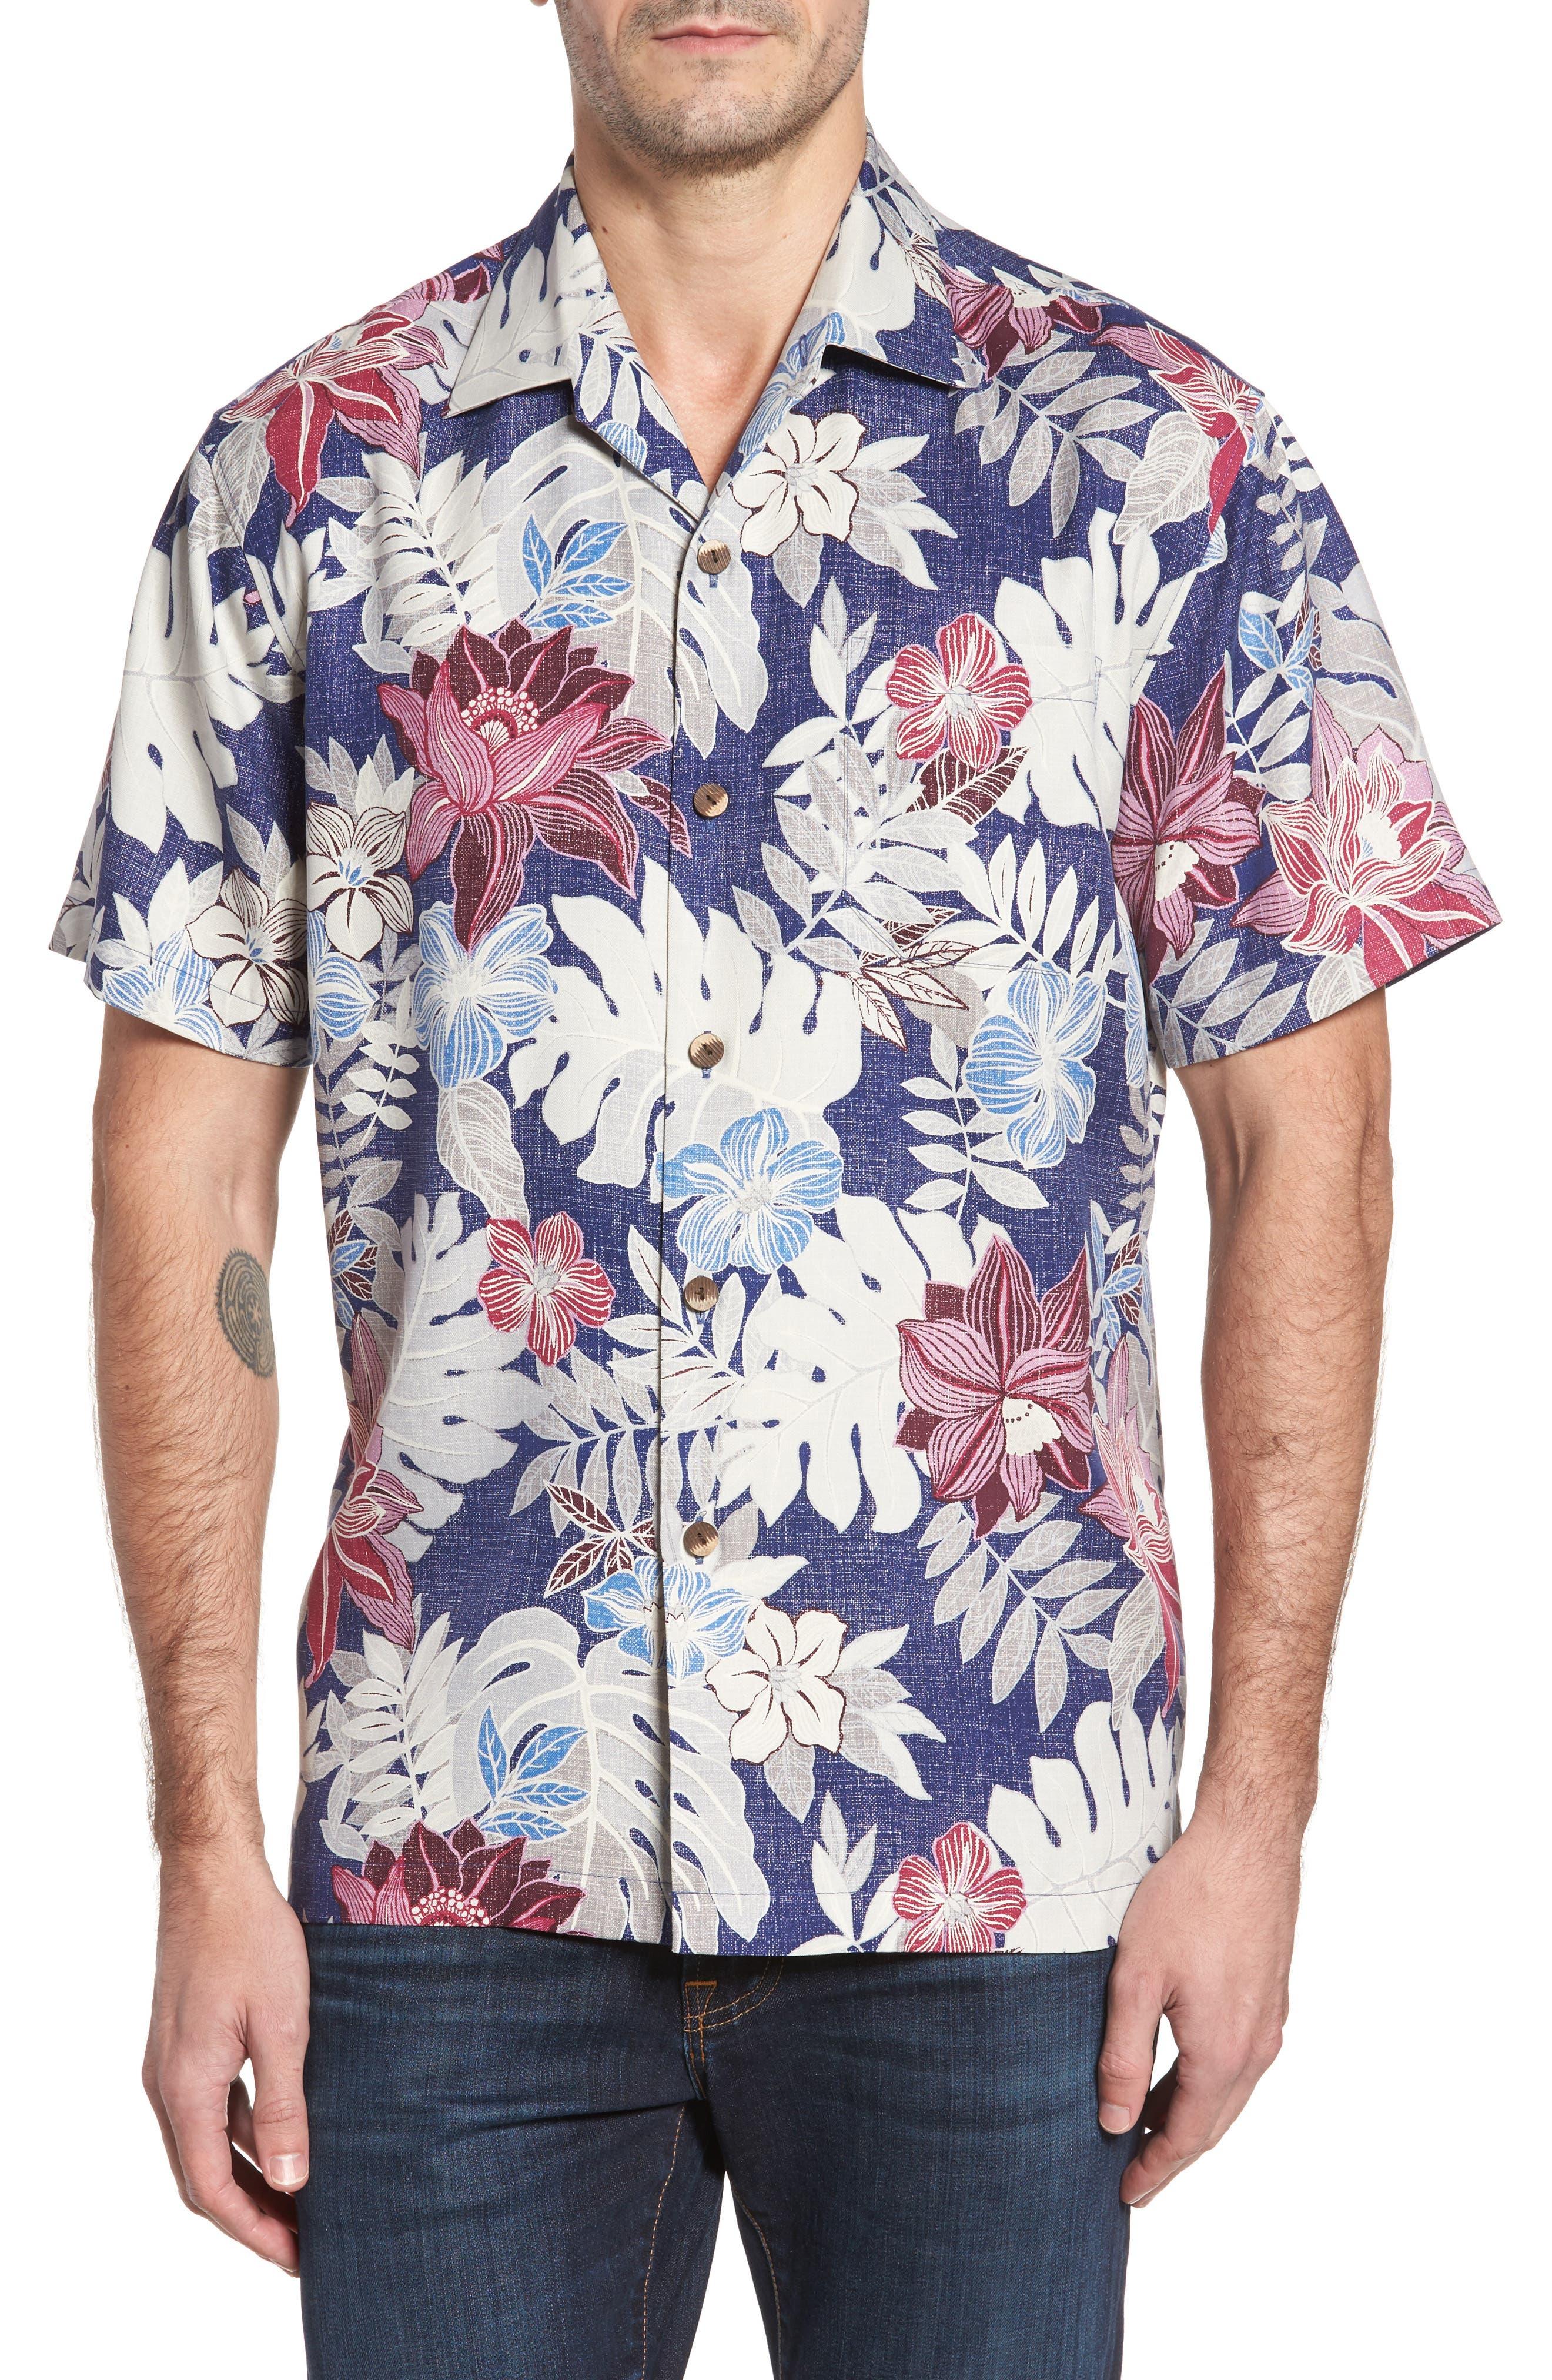 Main Image - Tommy Bahama Desert Blooms Original Fit Print Silk Camp Shirt